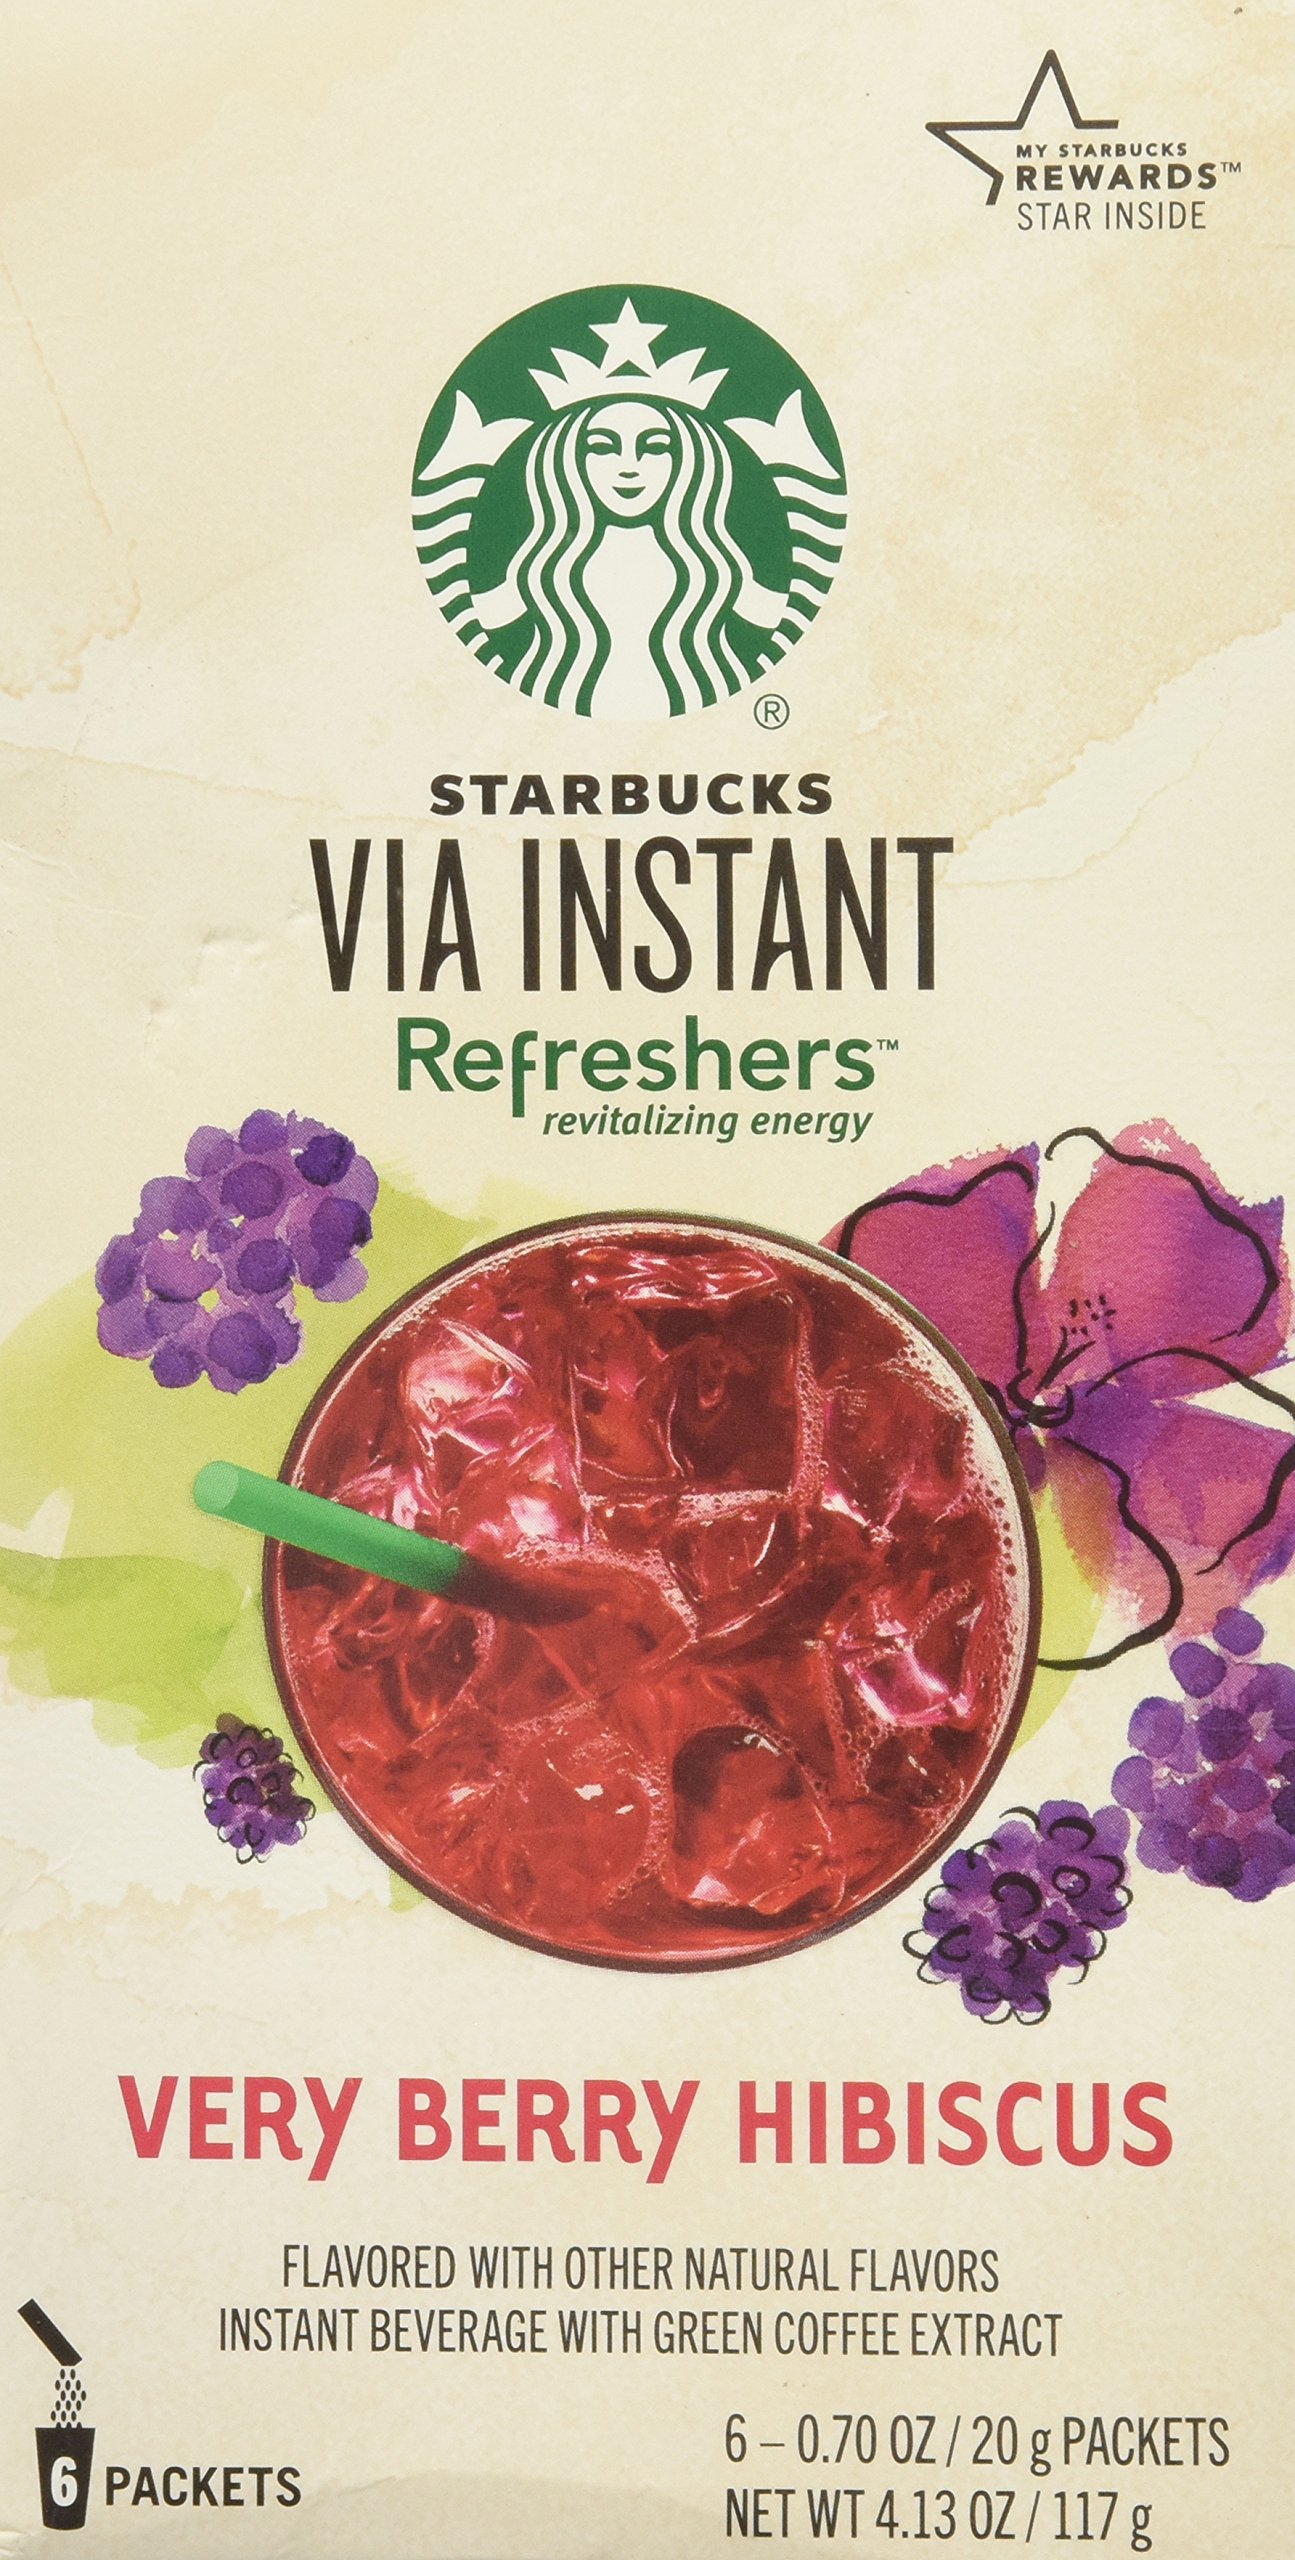 Starbucks VIA Instant Refreshers Very Berry Hibiscus (1 box of 6 packets)